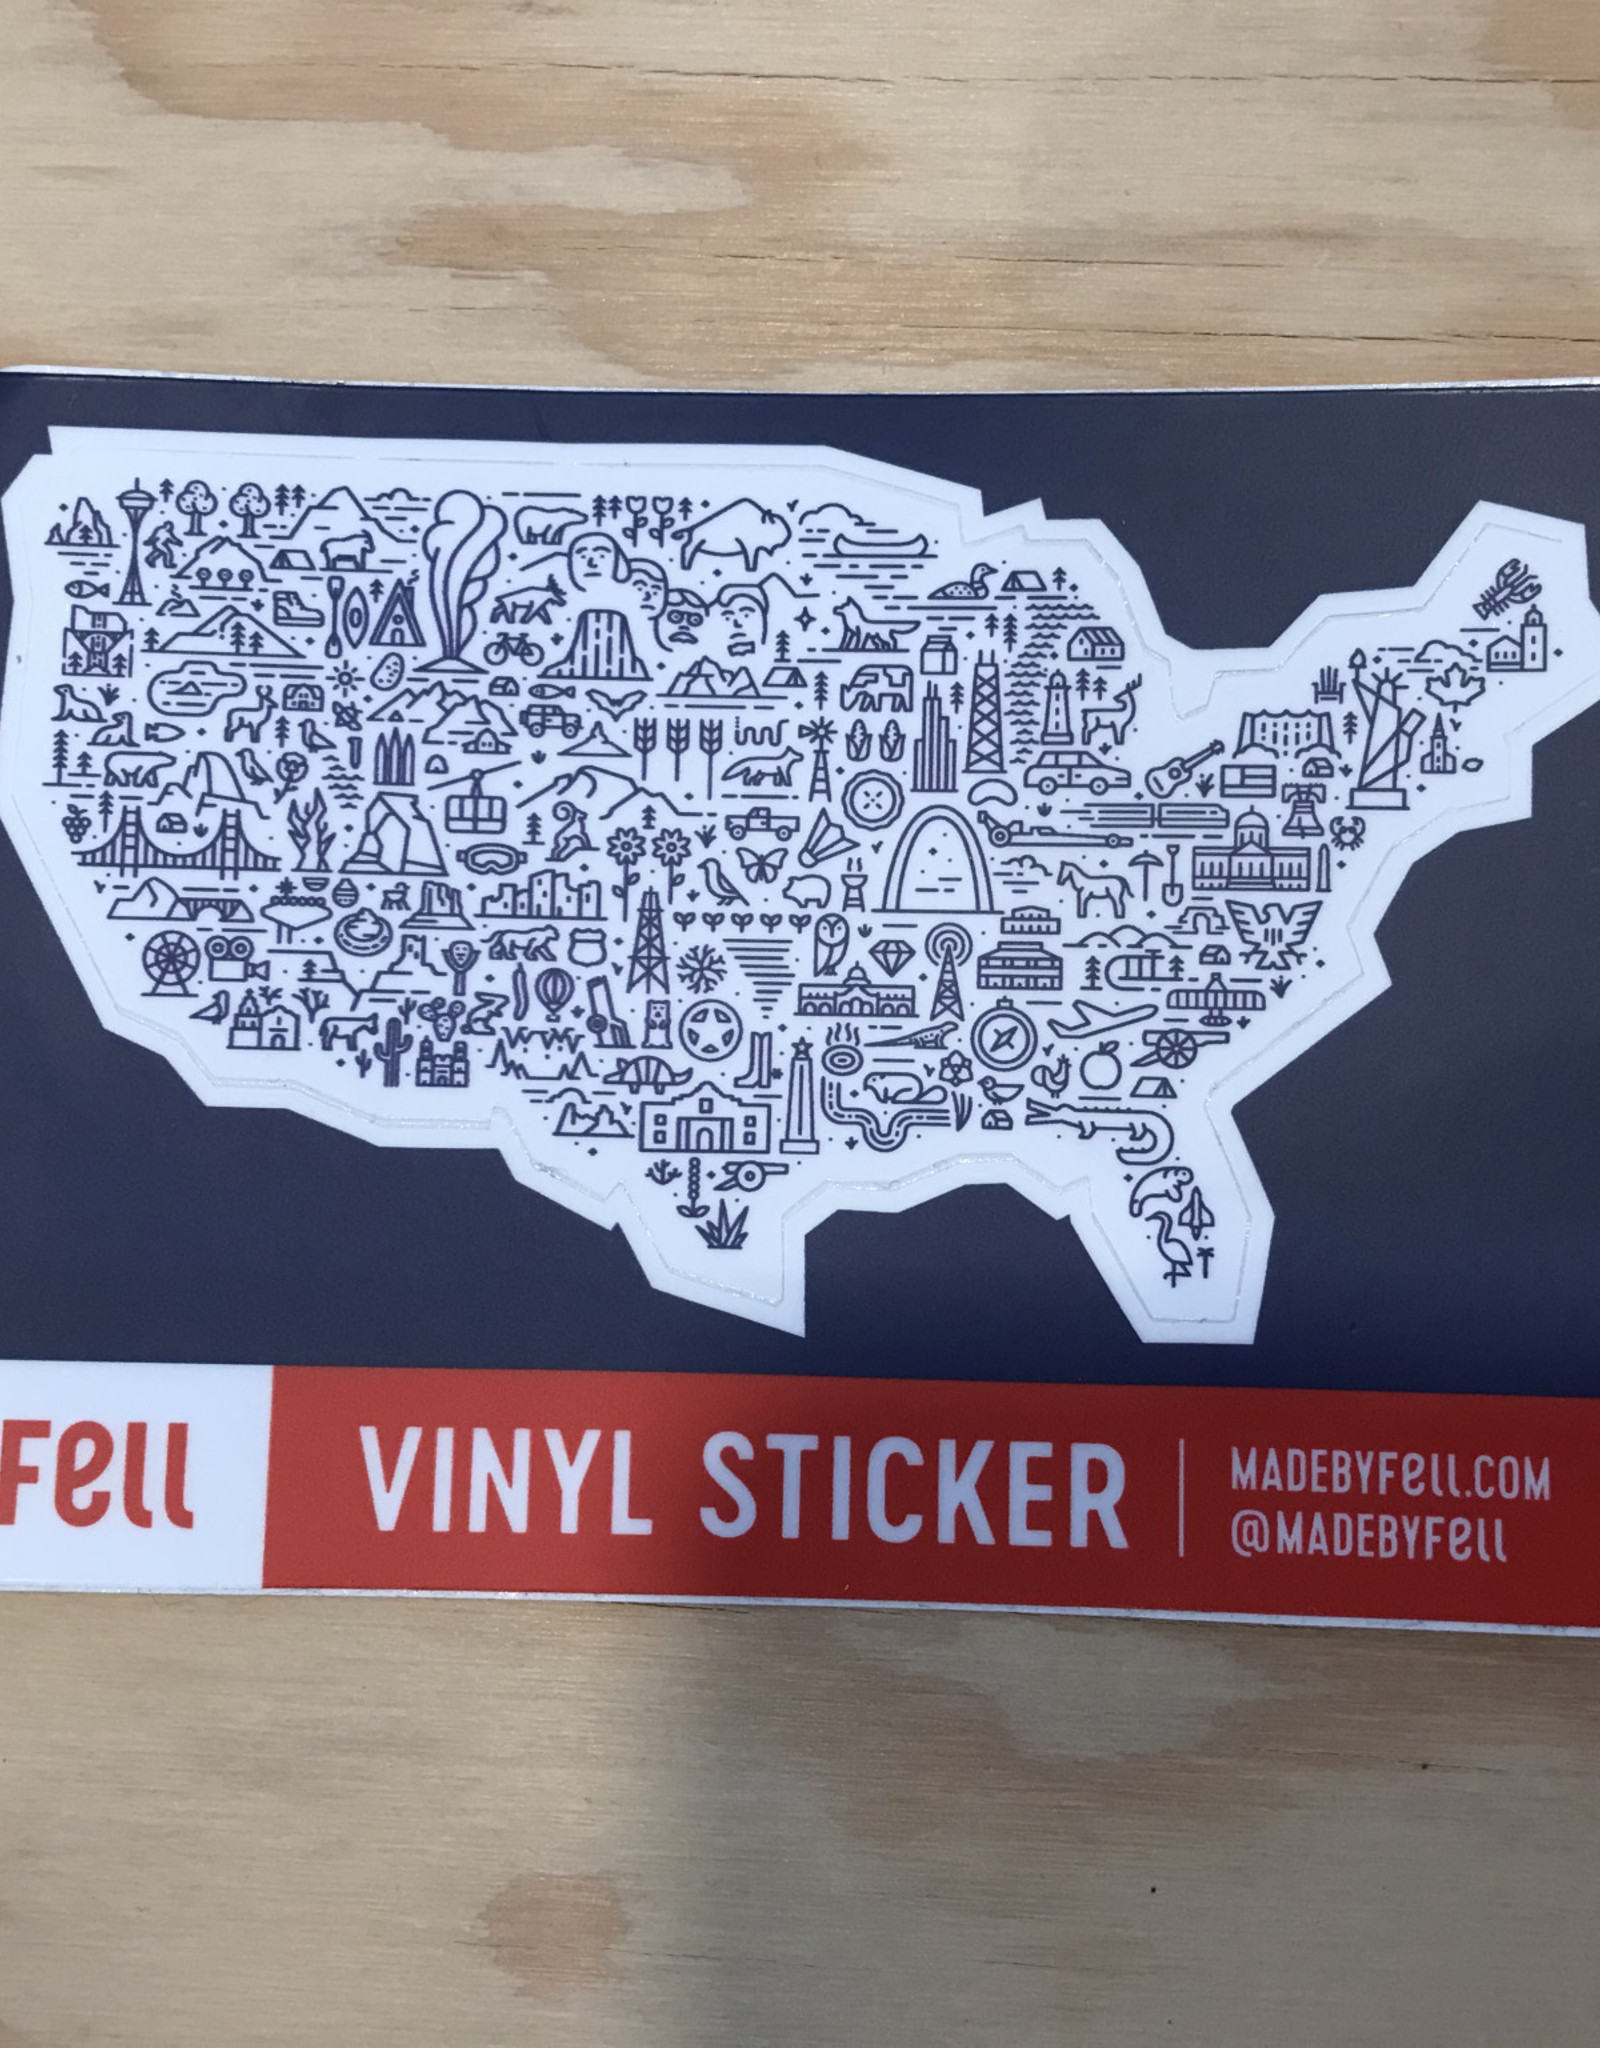 Fell Sticker- MOA